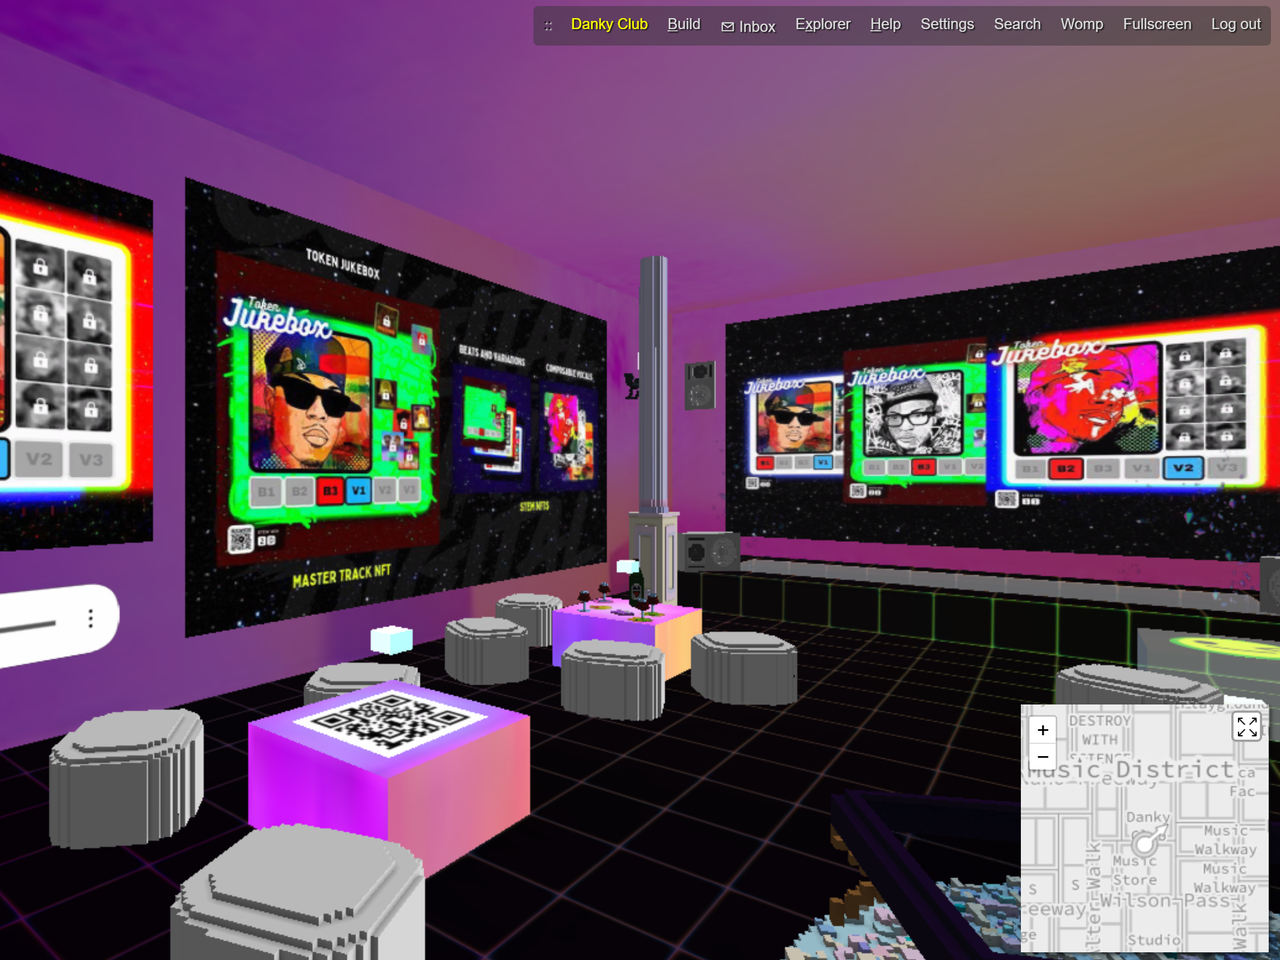 Token Jukebox_Danky Club